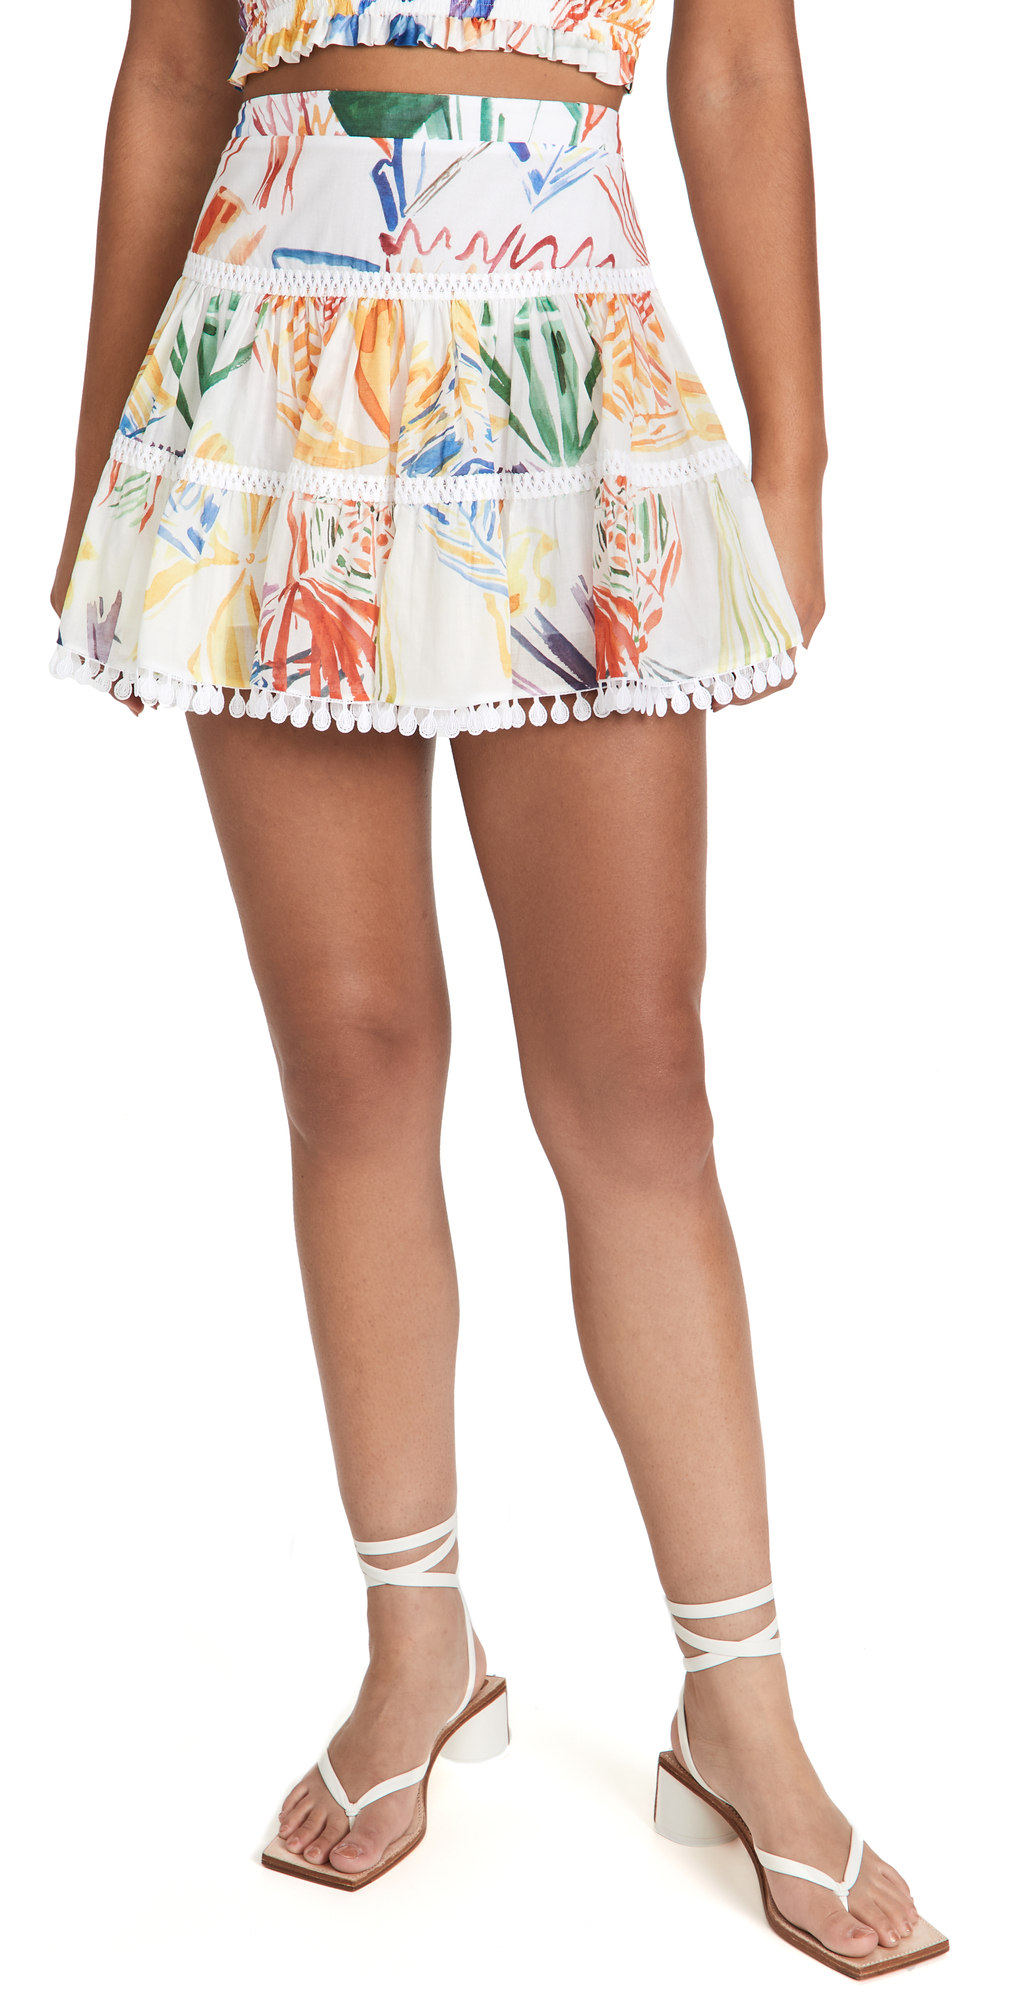 Bridget Short Skirt